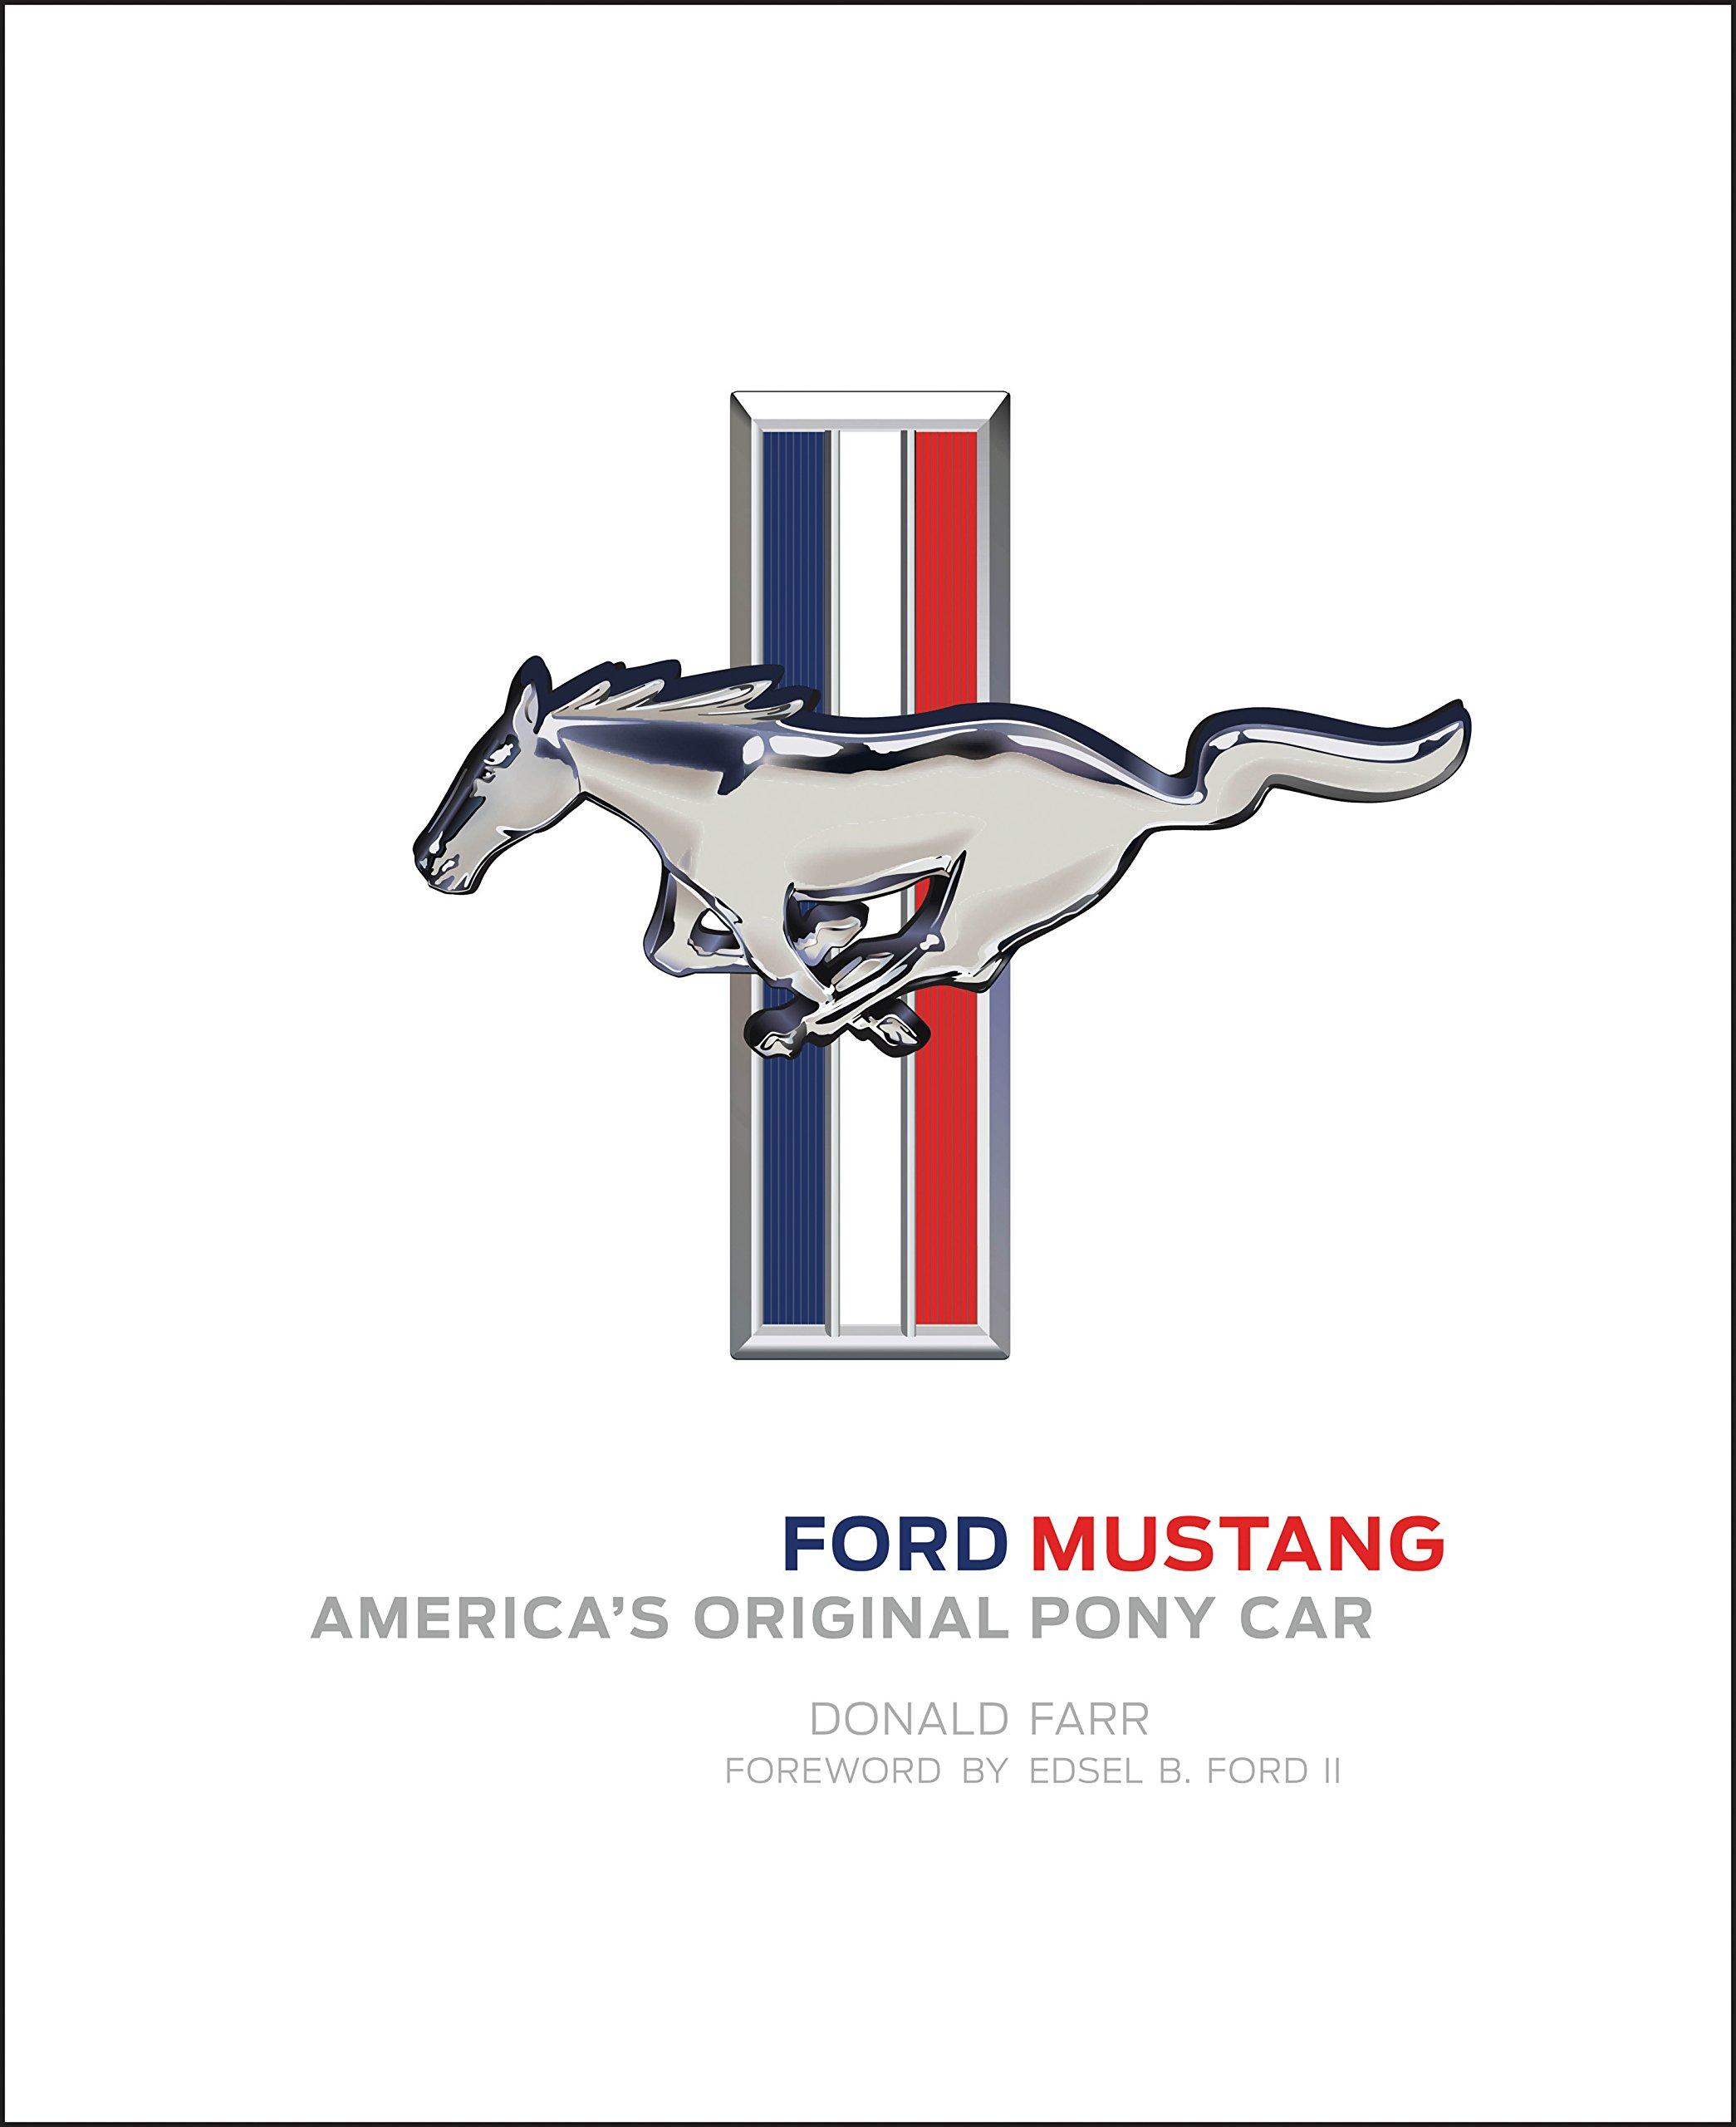 Ford mustang americas original pony car donald farr edsel ford ford mustang americas original pony car donald farr edsel ford 9780760352144 amazon books biocorpaavc Gallery